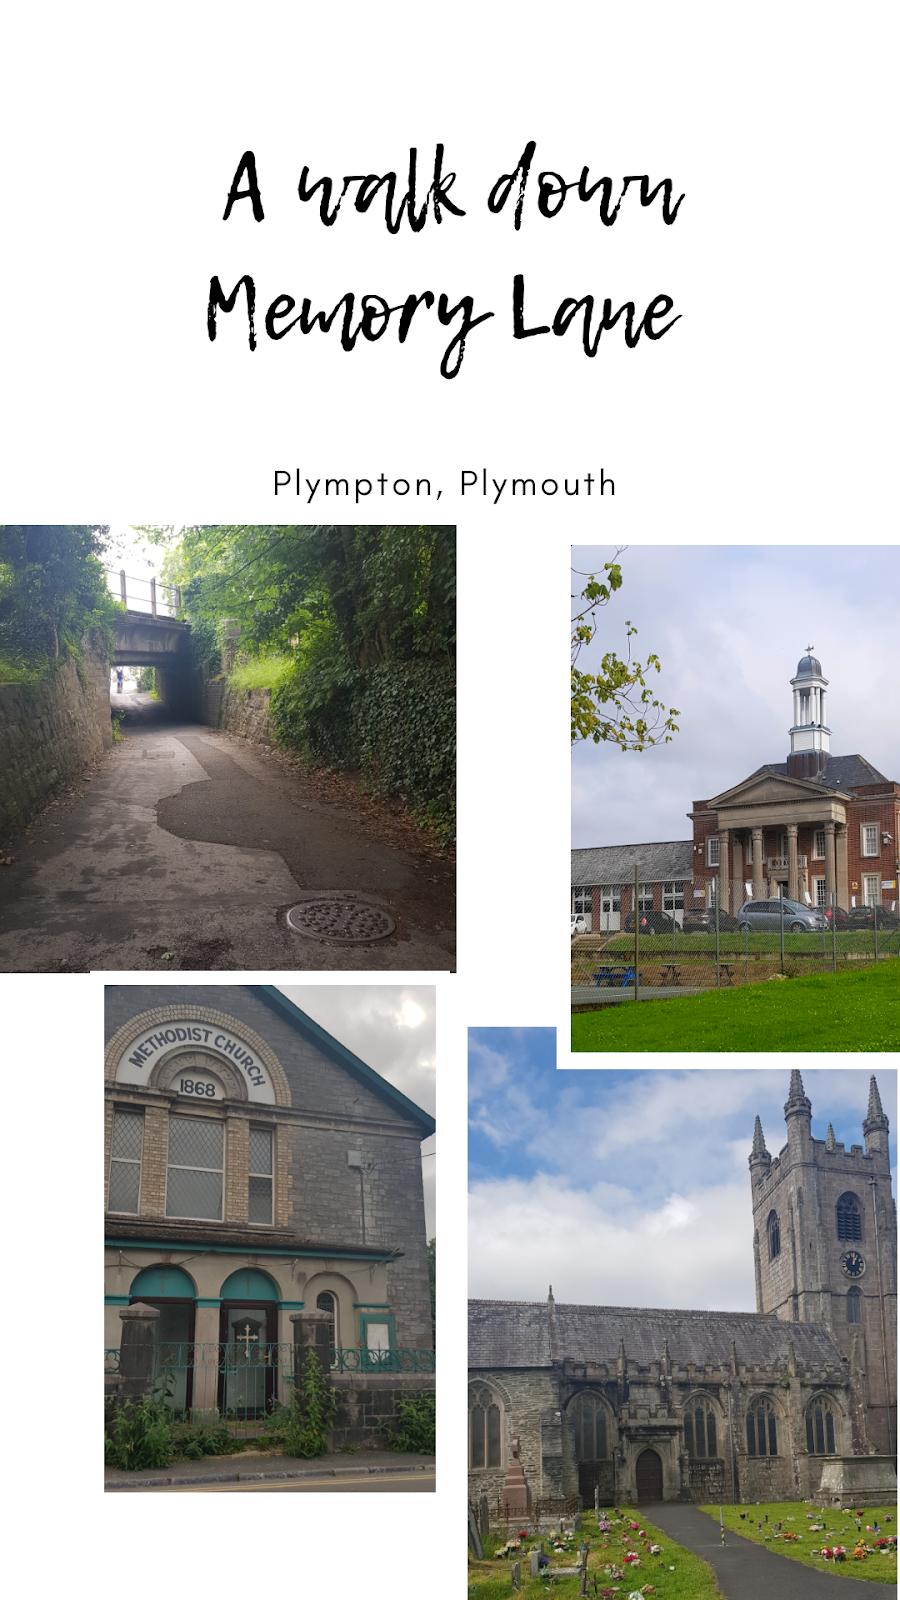 Photos of landmarks in Plympton near Plymouth